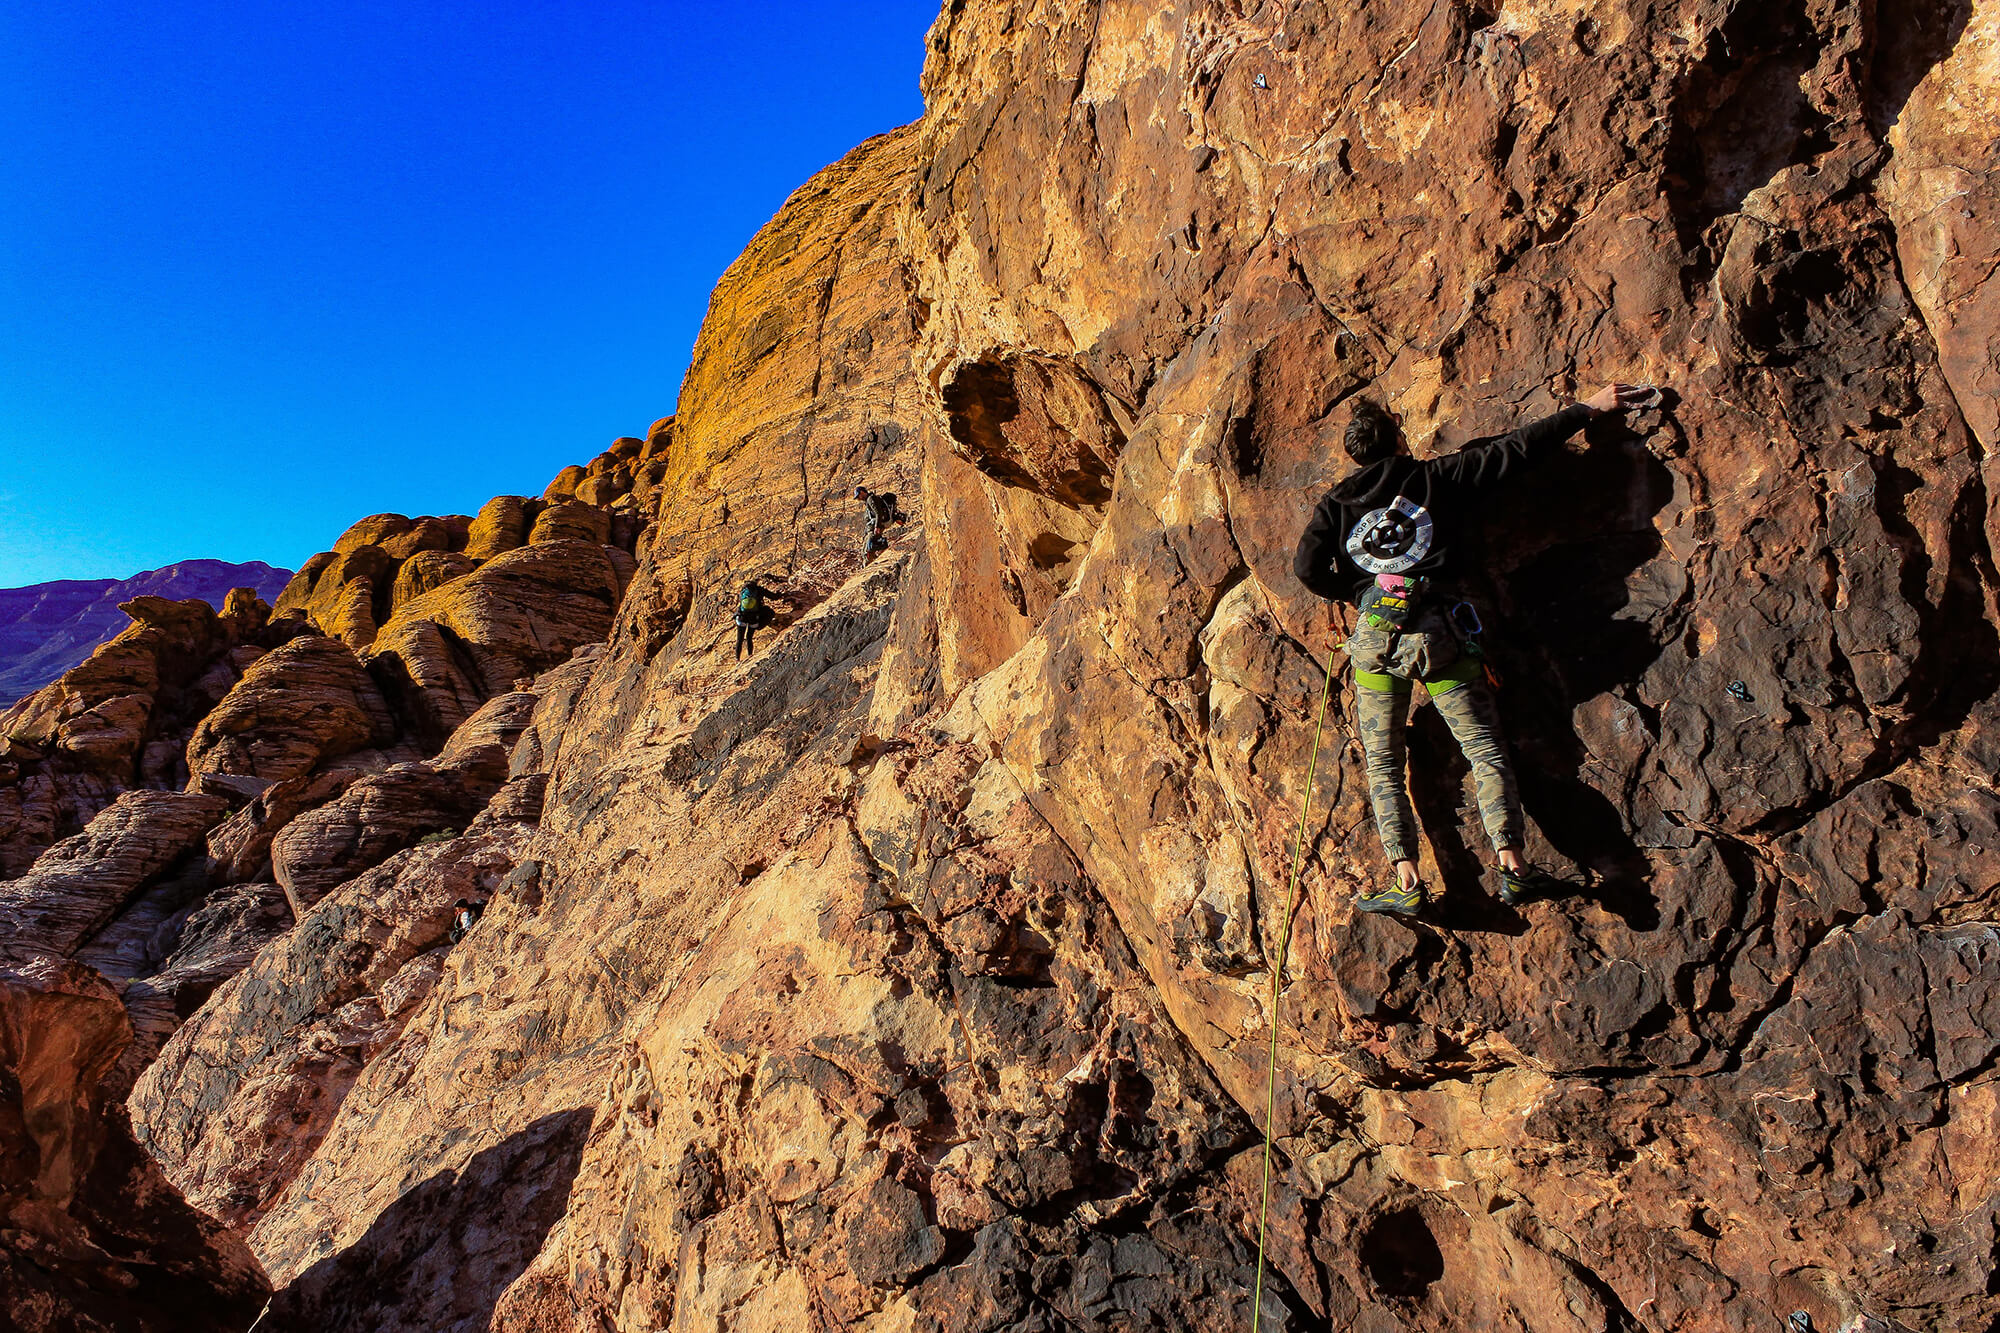 Kevin Climbs